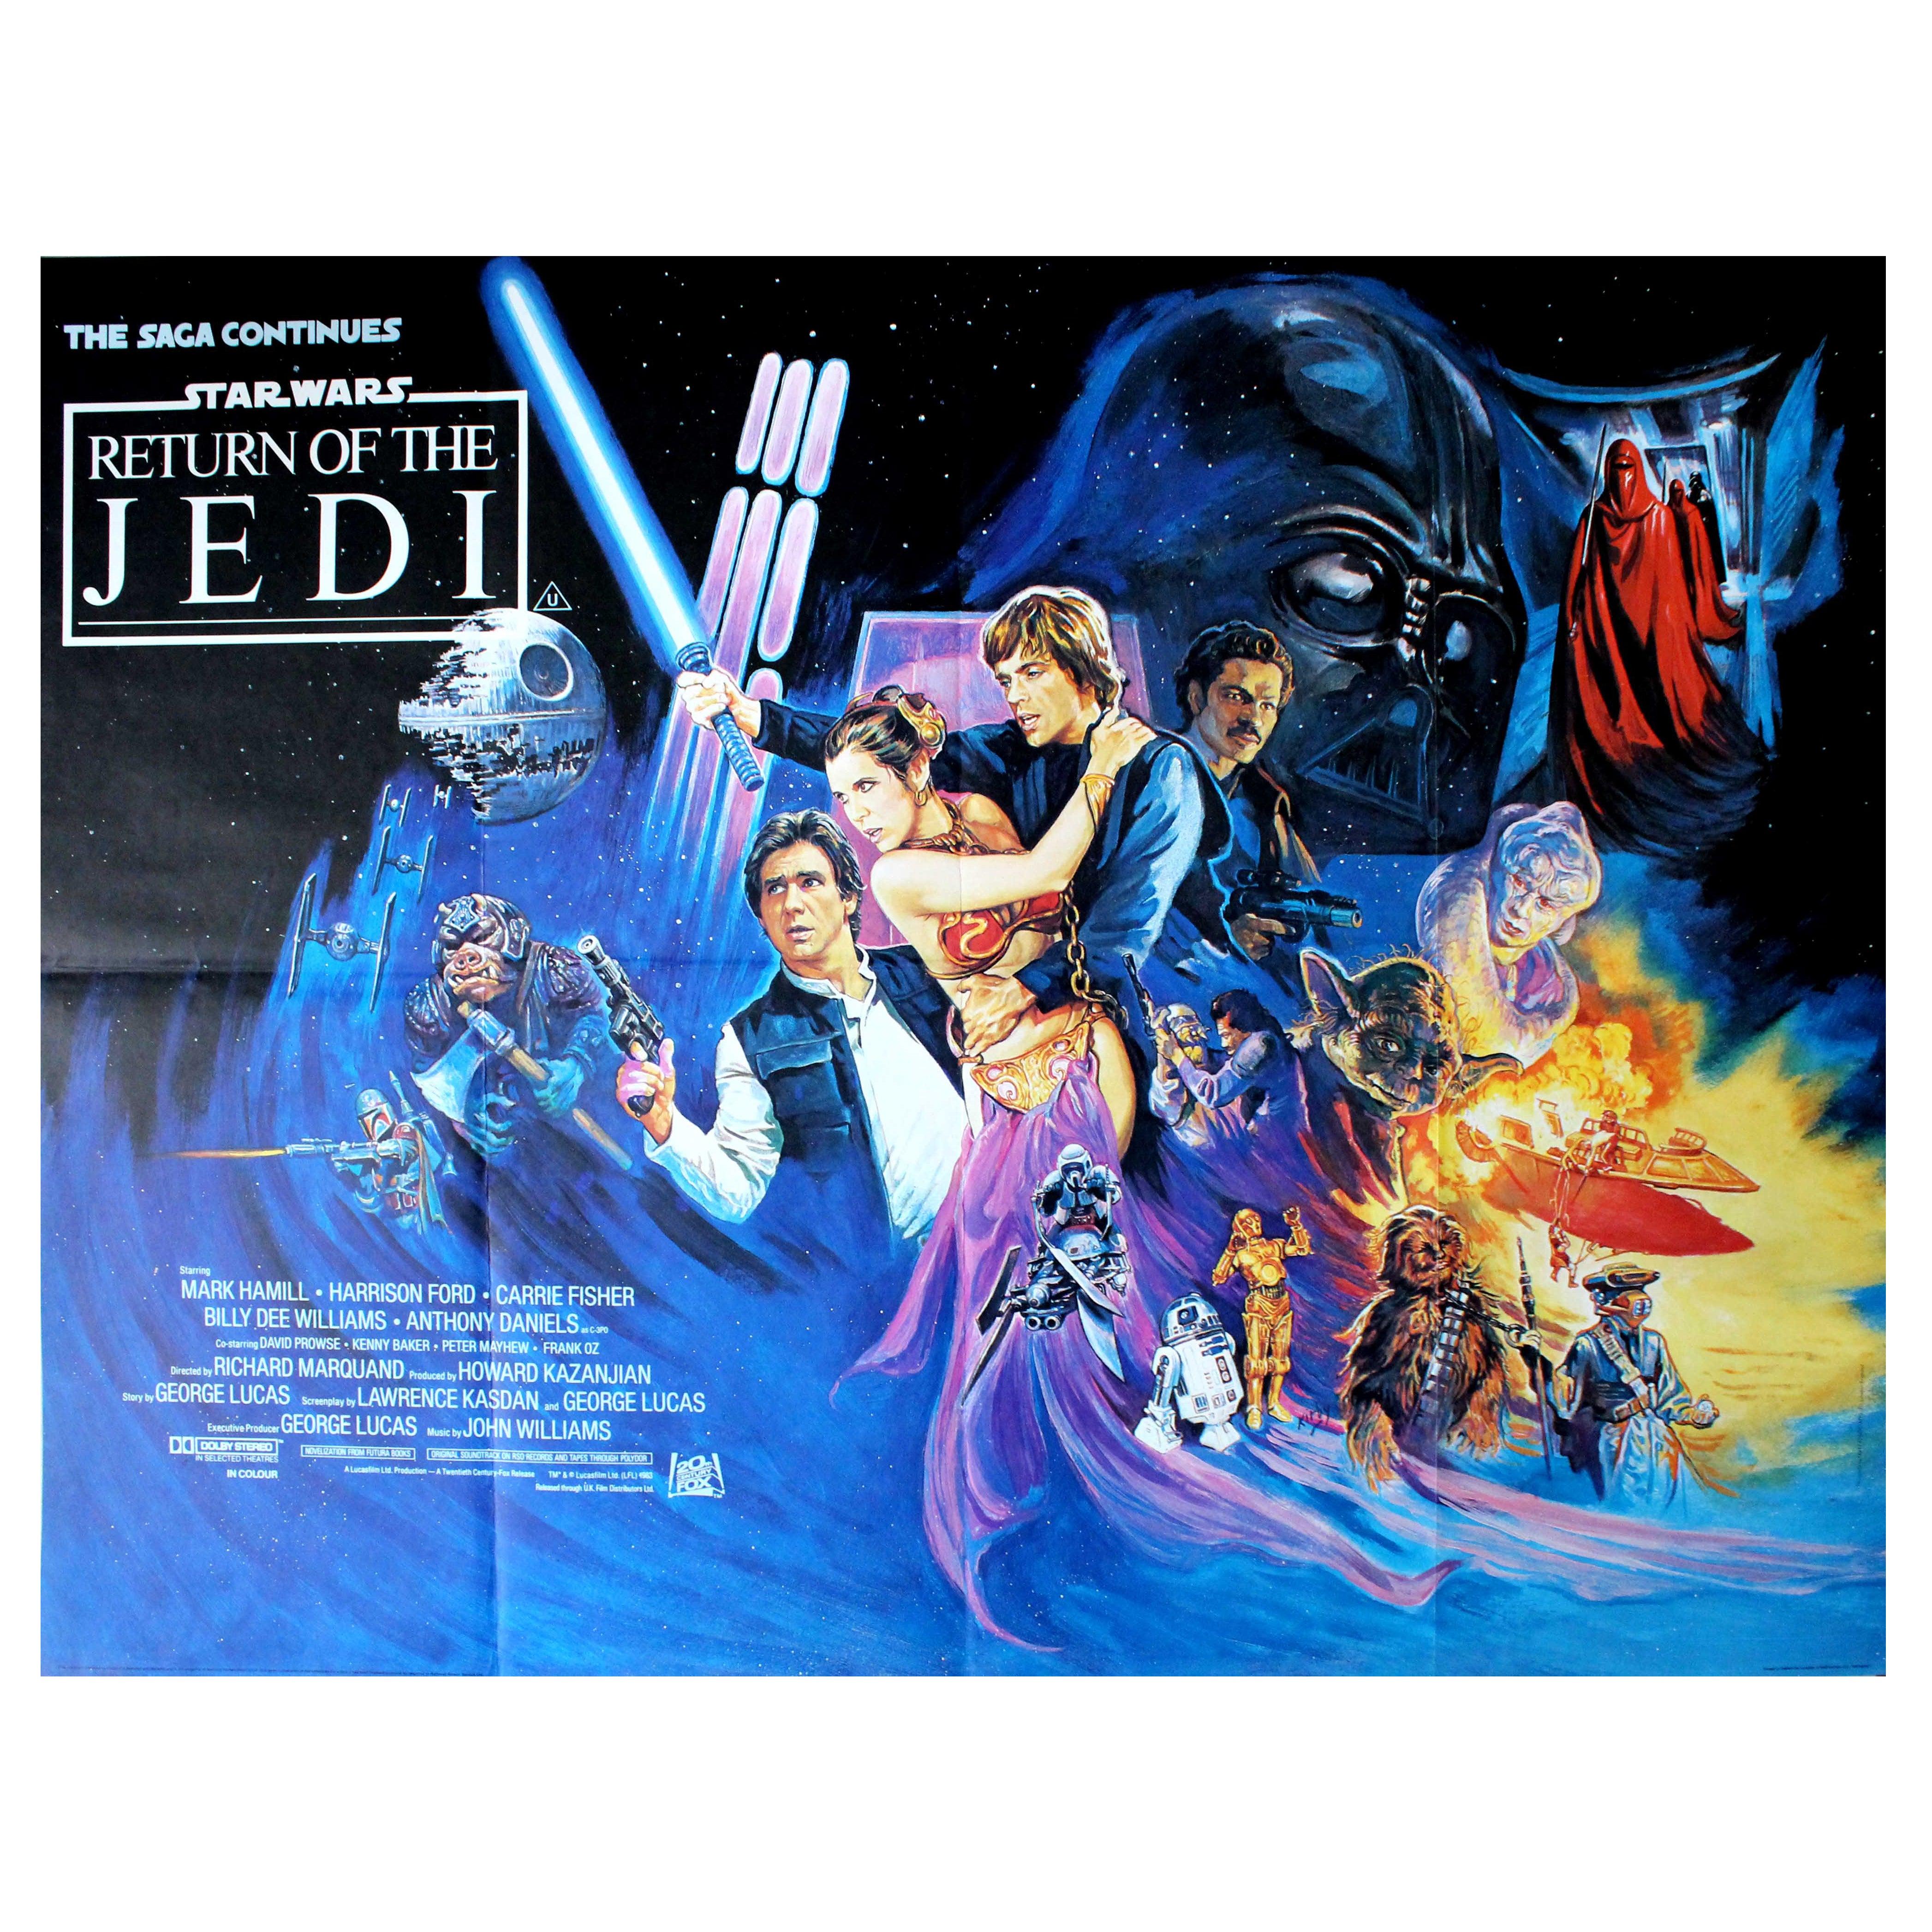 1977 Star Wars movie poster print 114